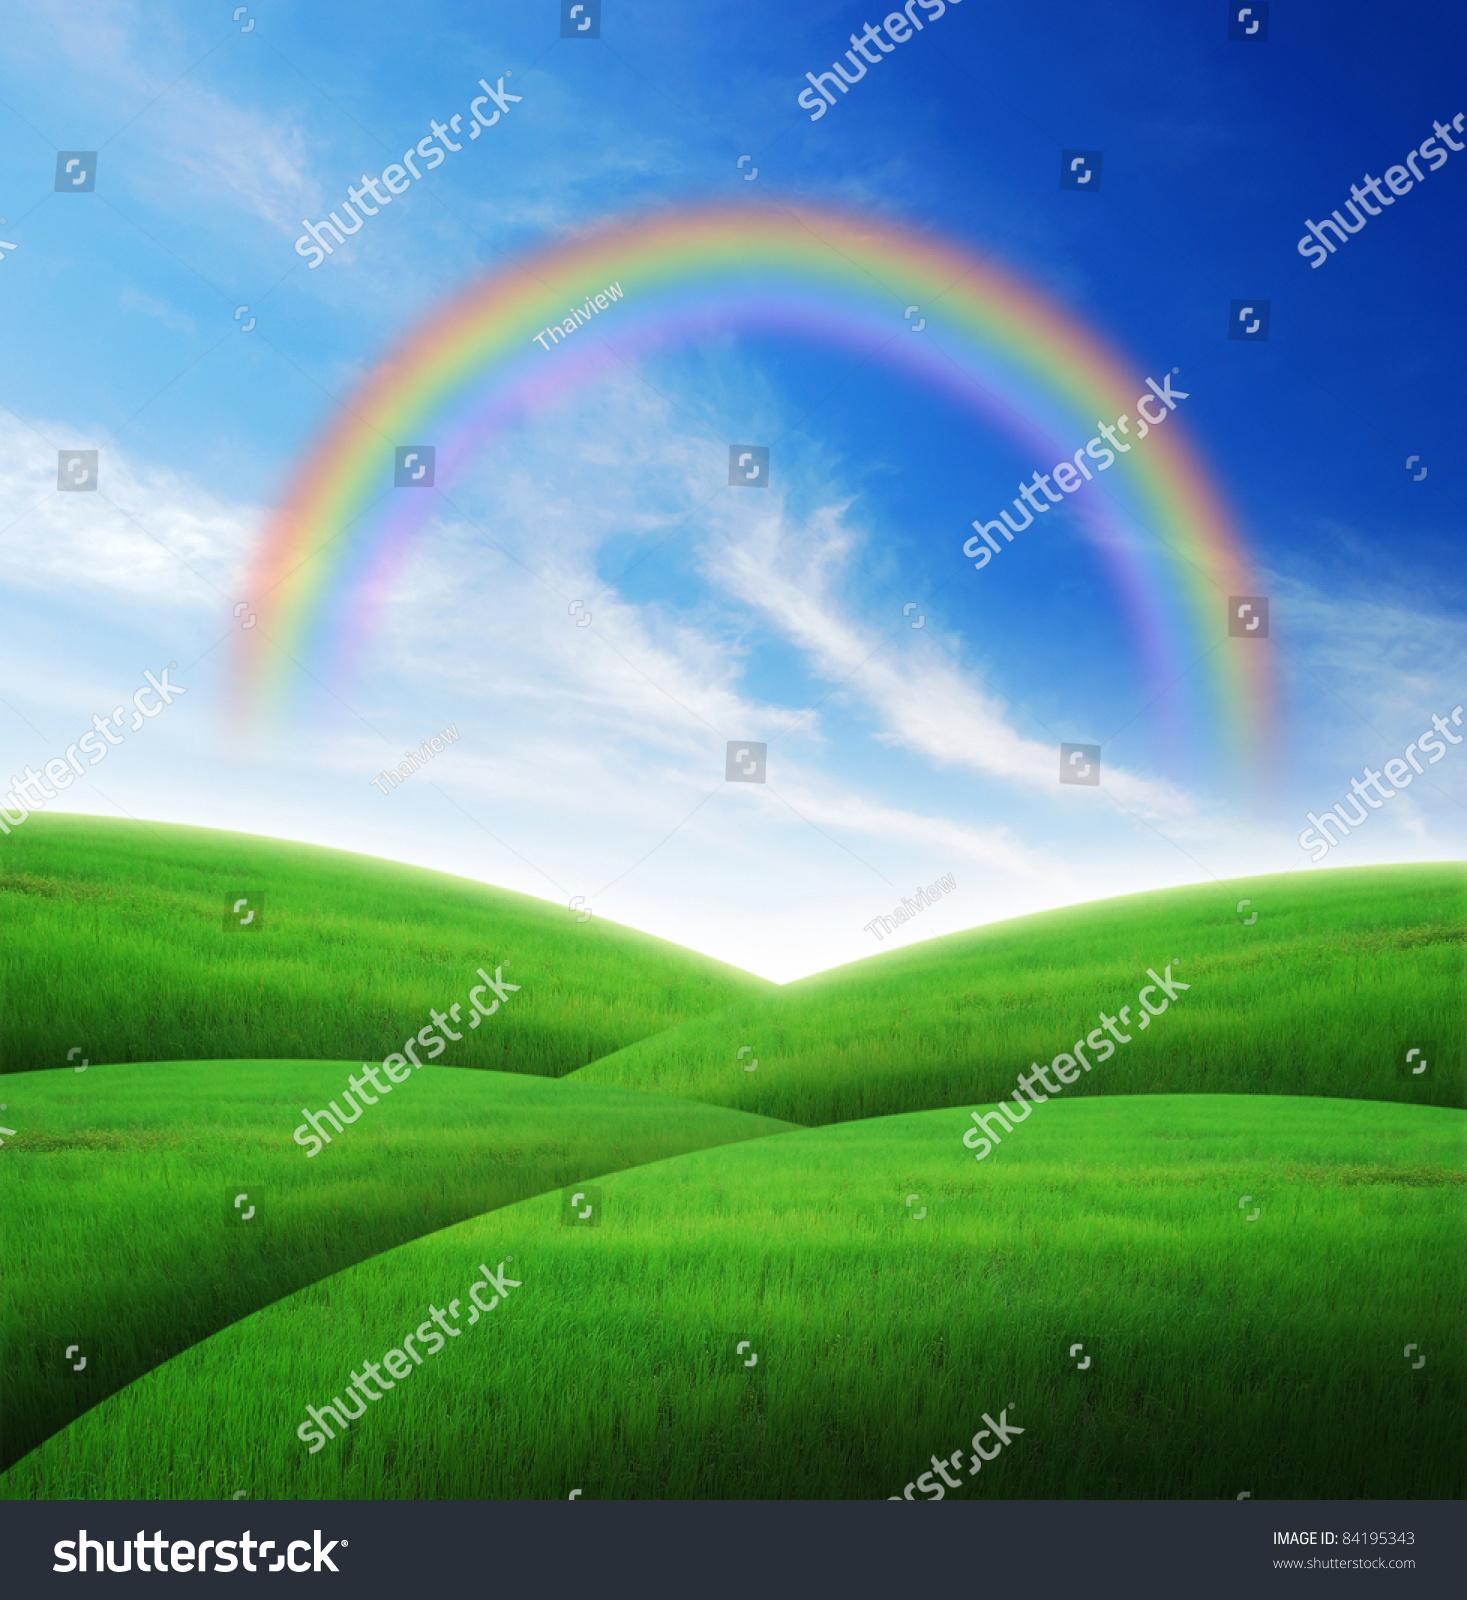 green grass landscape blue sky backgrounds stock photo & image